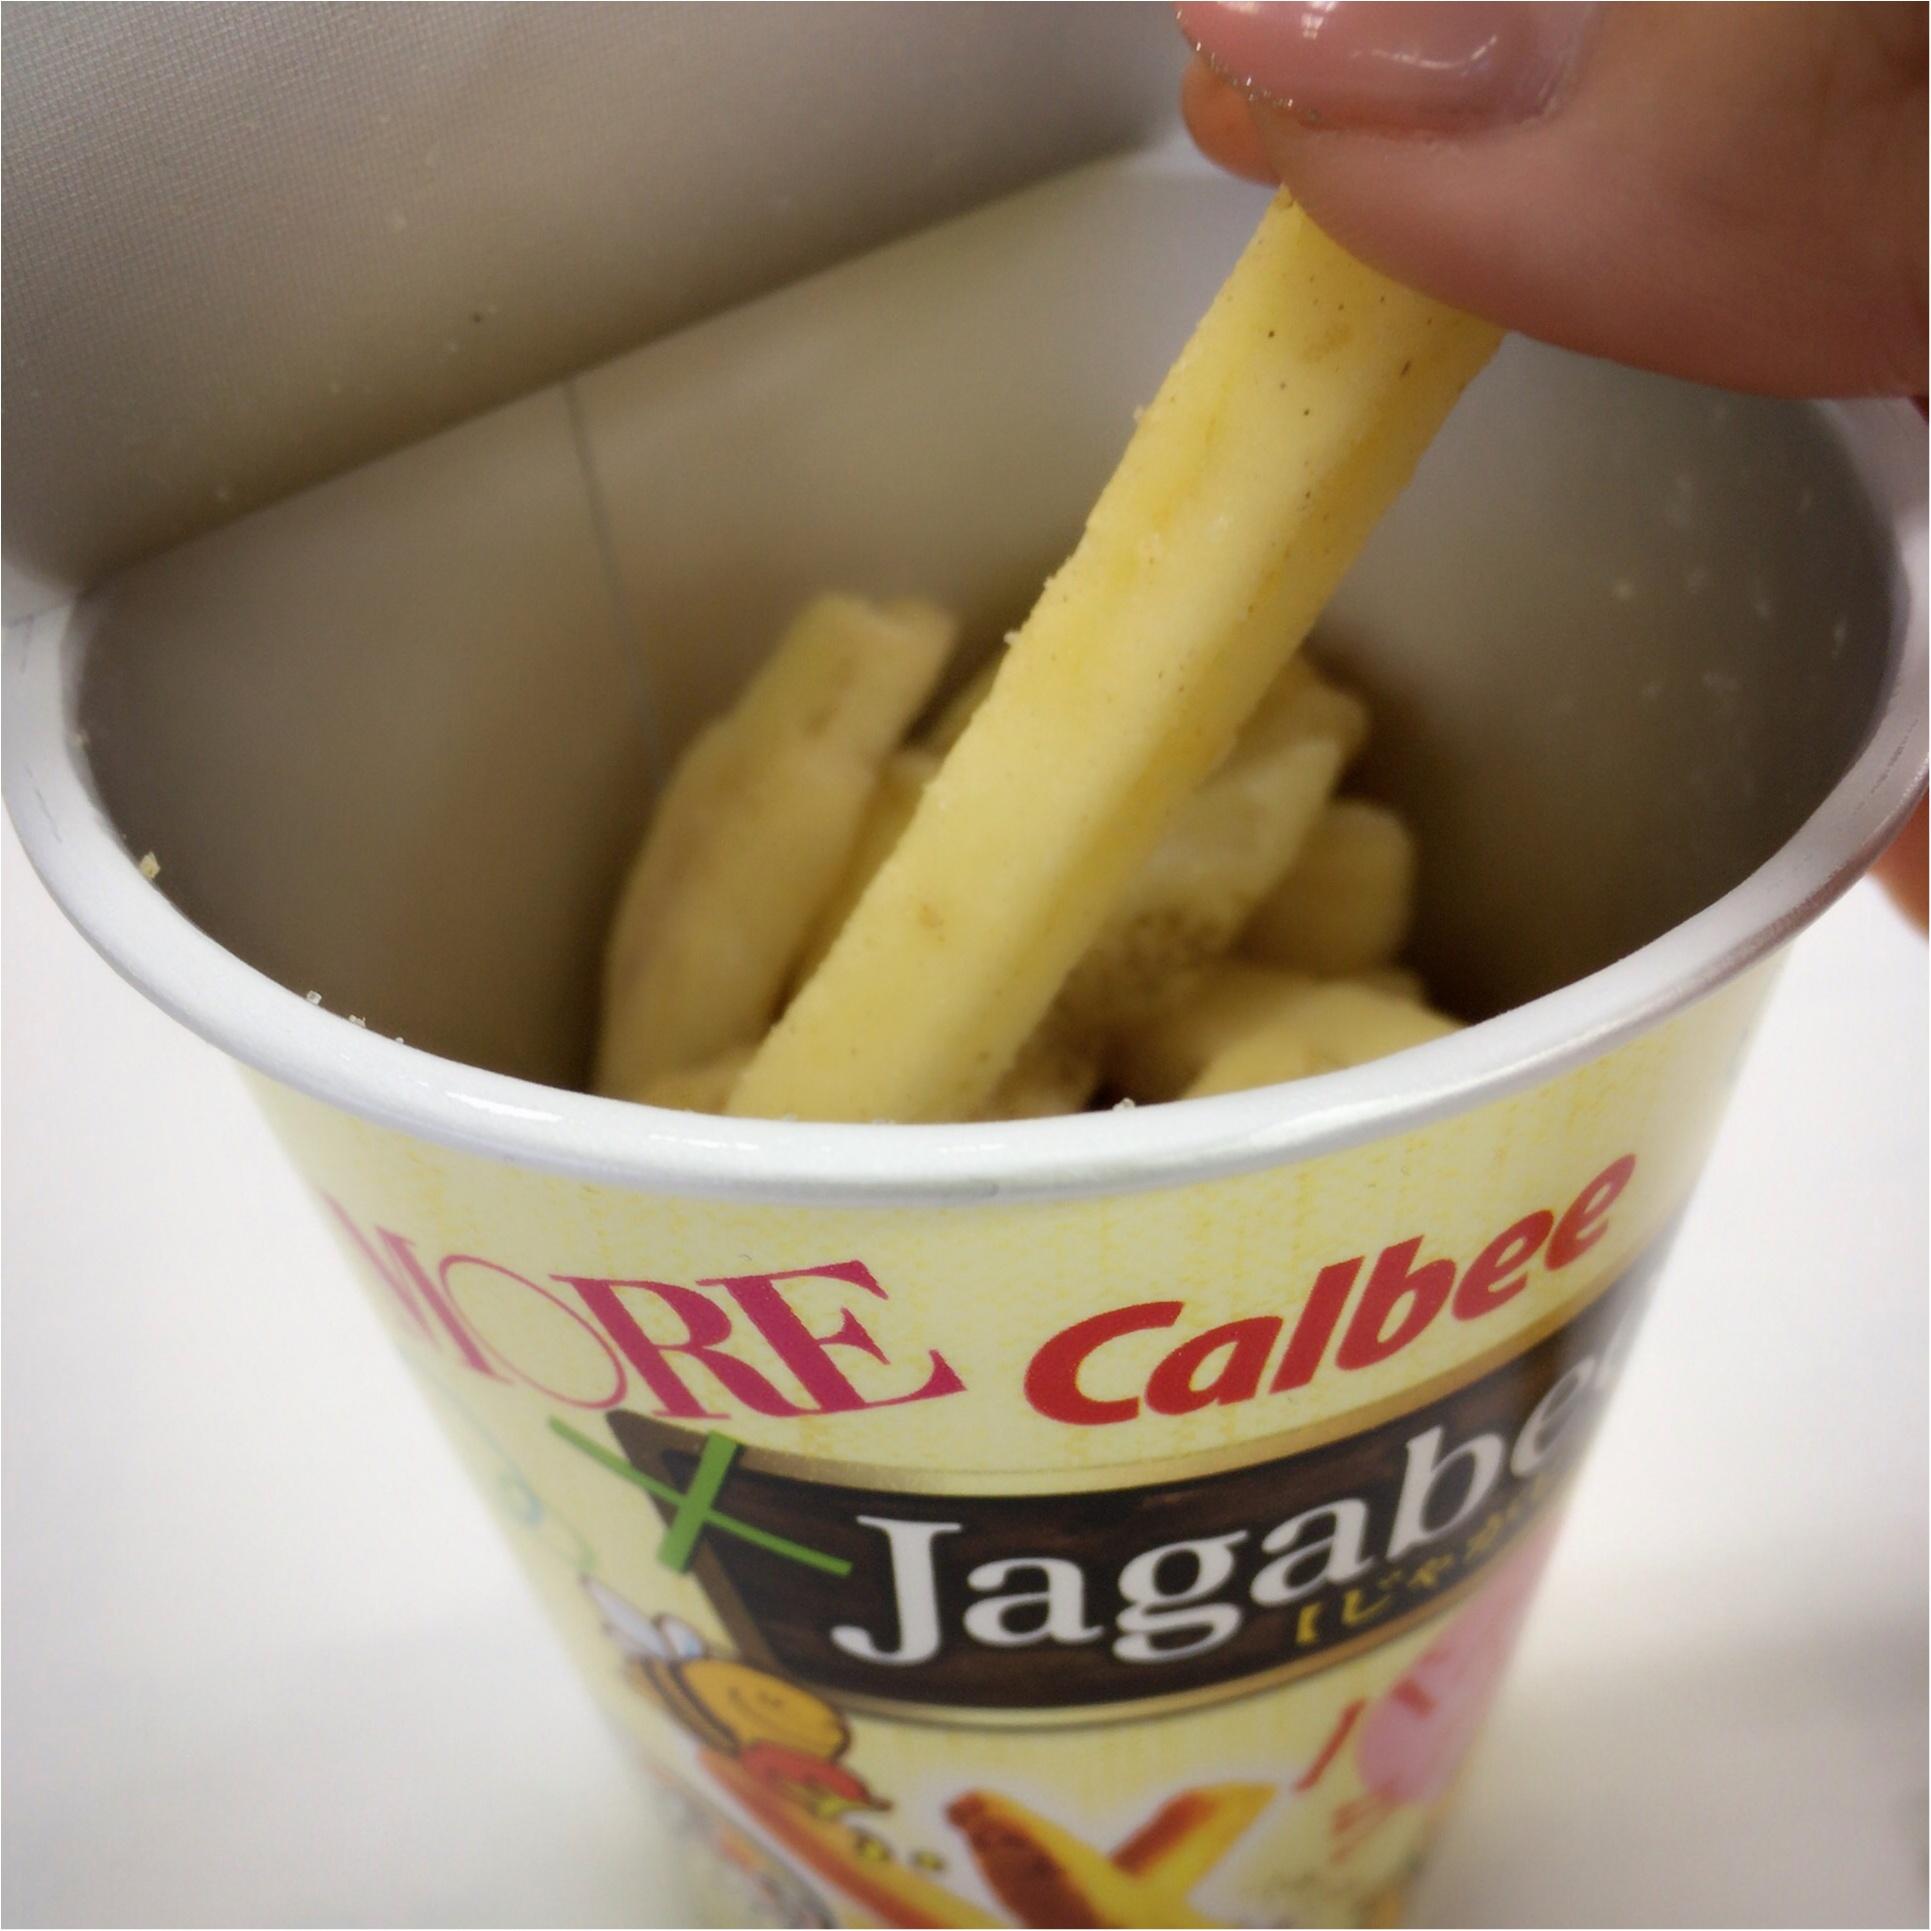 【MORE×Jagabee】シナモン好きは必見!! お仕事中のリフレッシュお菓子はスウィーツみたいなJagabeeがおすすめ♡_2